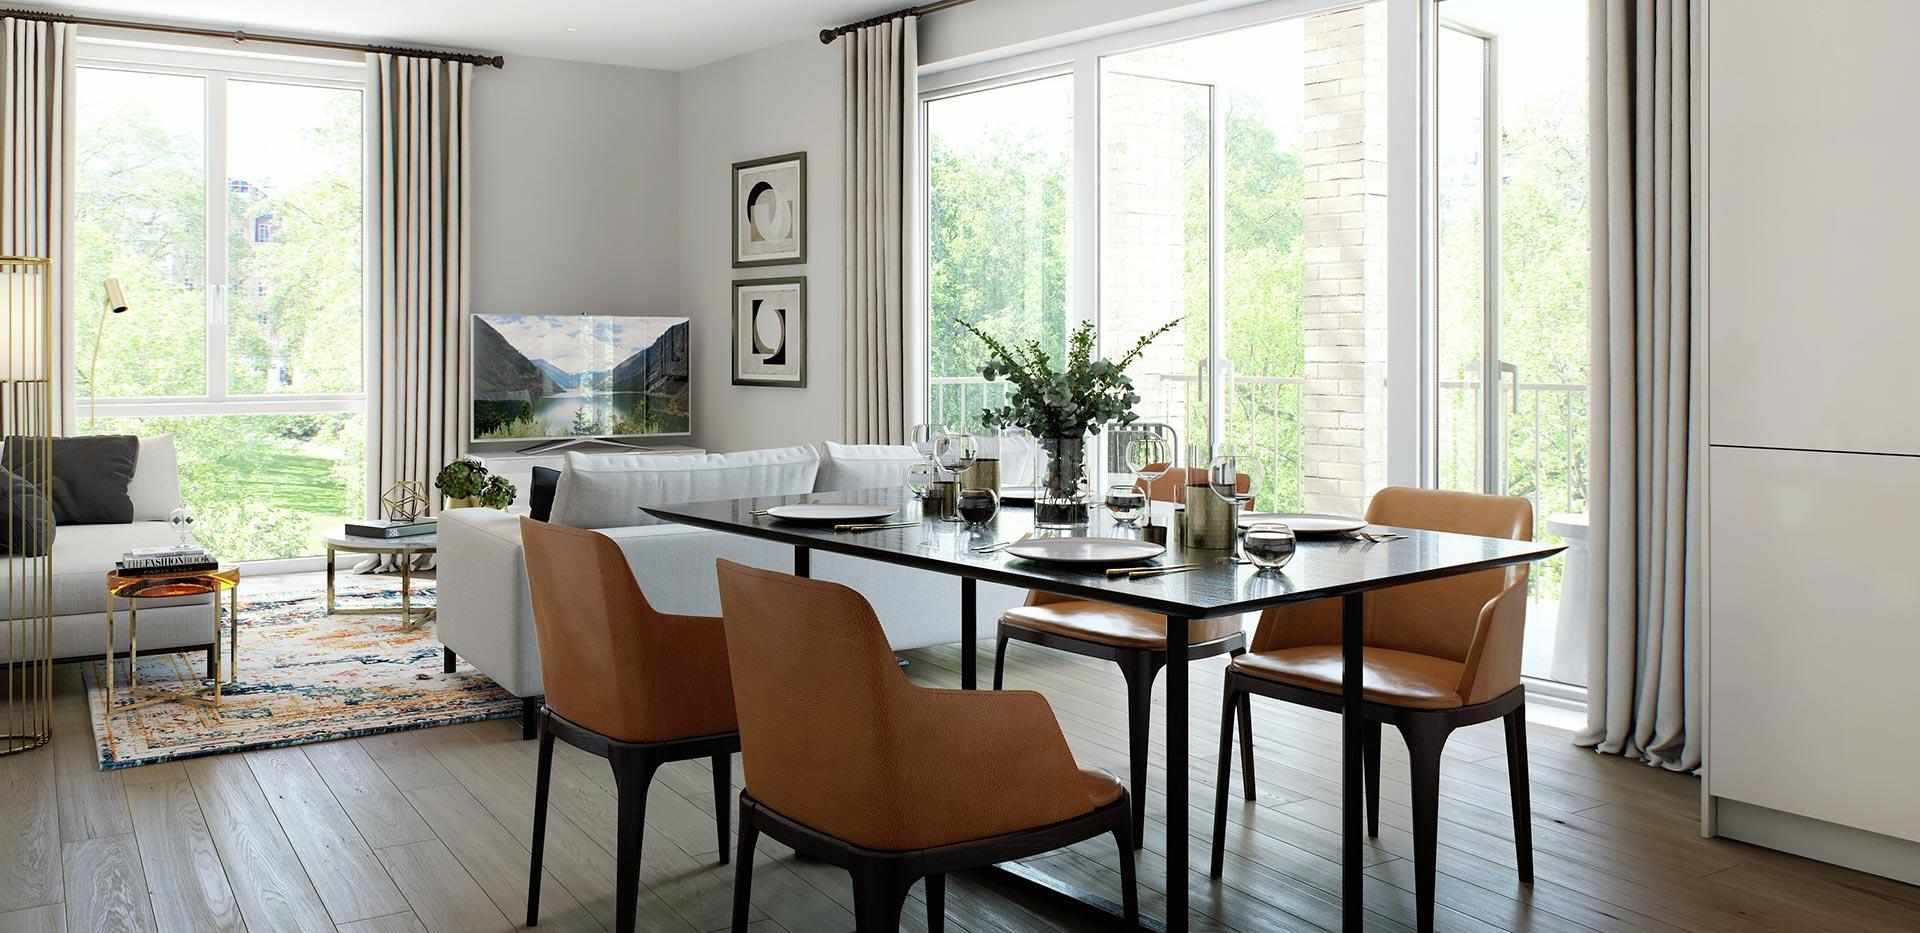 Forbury Apartments - CGI - 2.jpeg